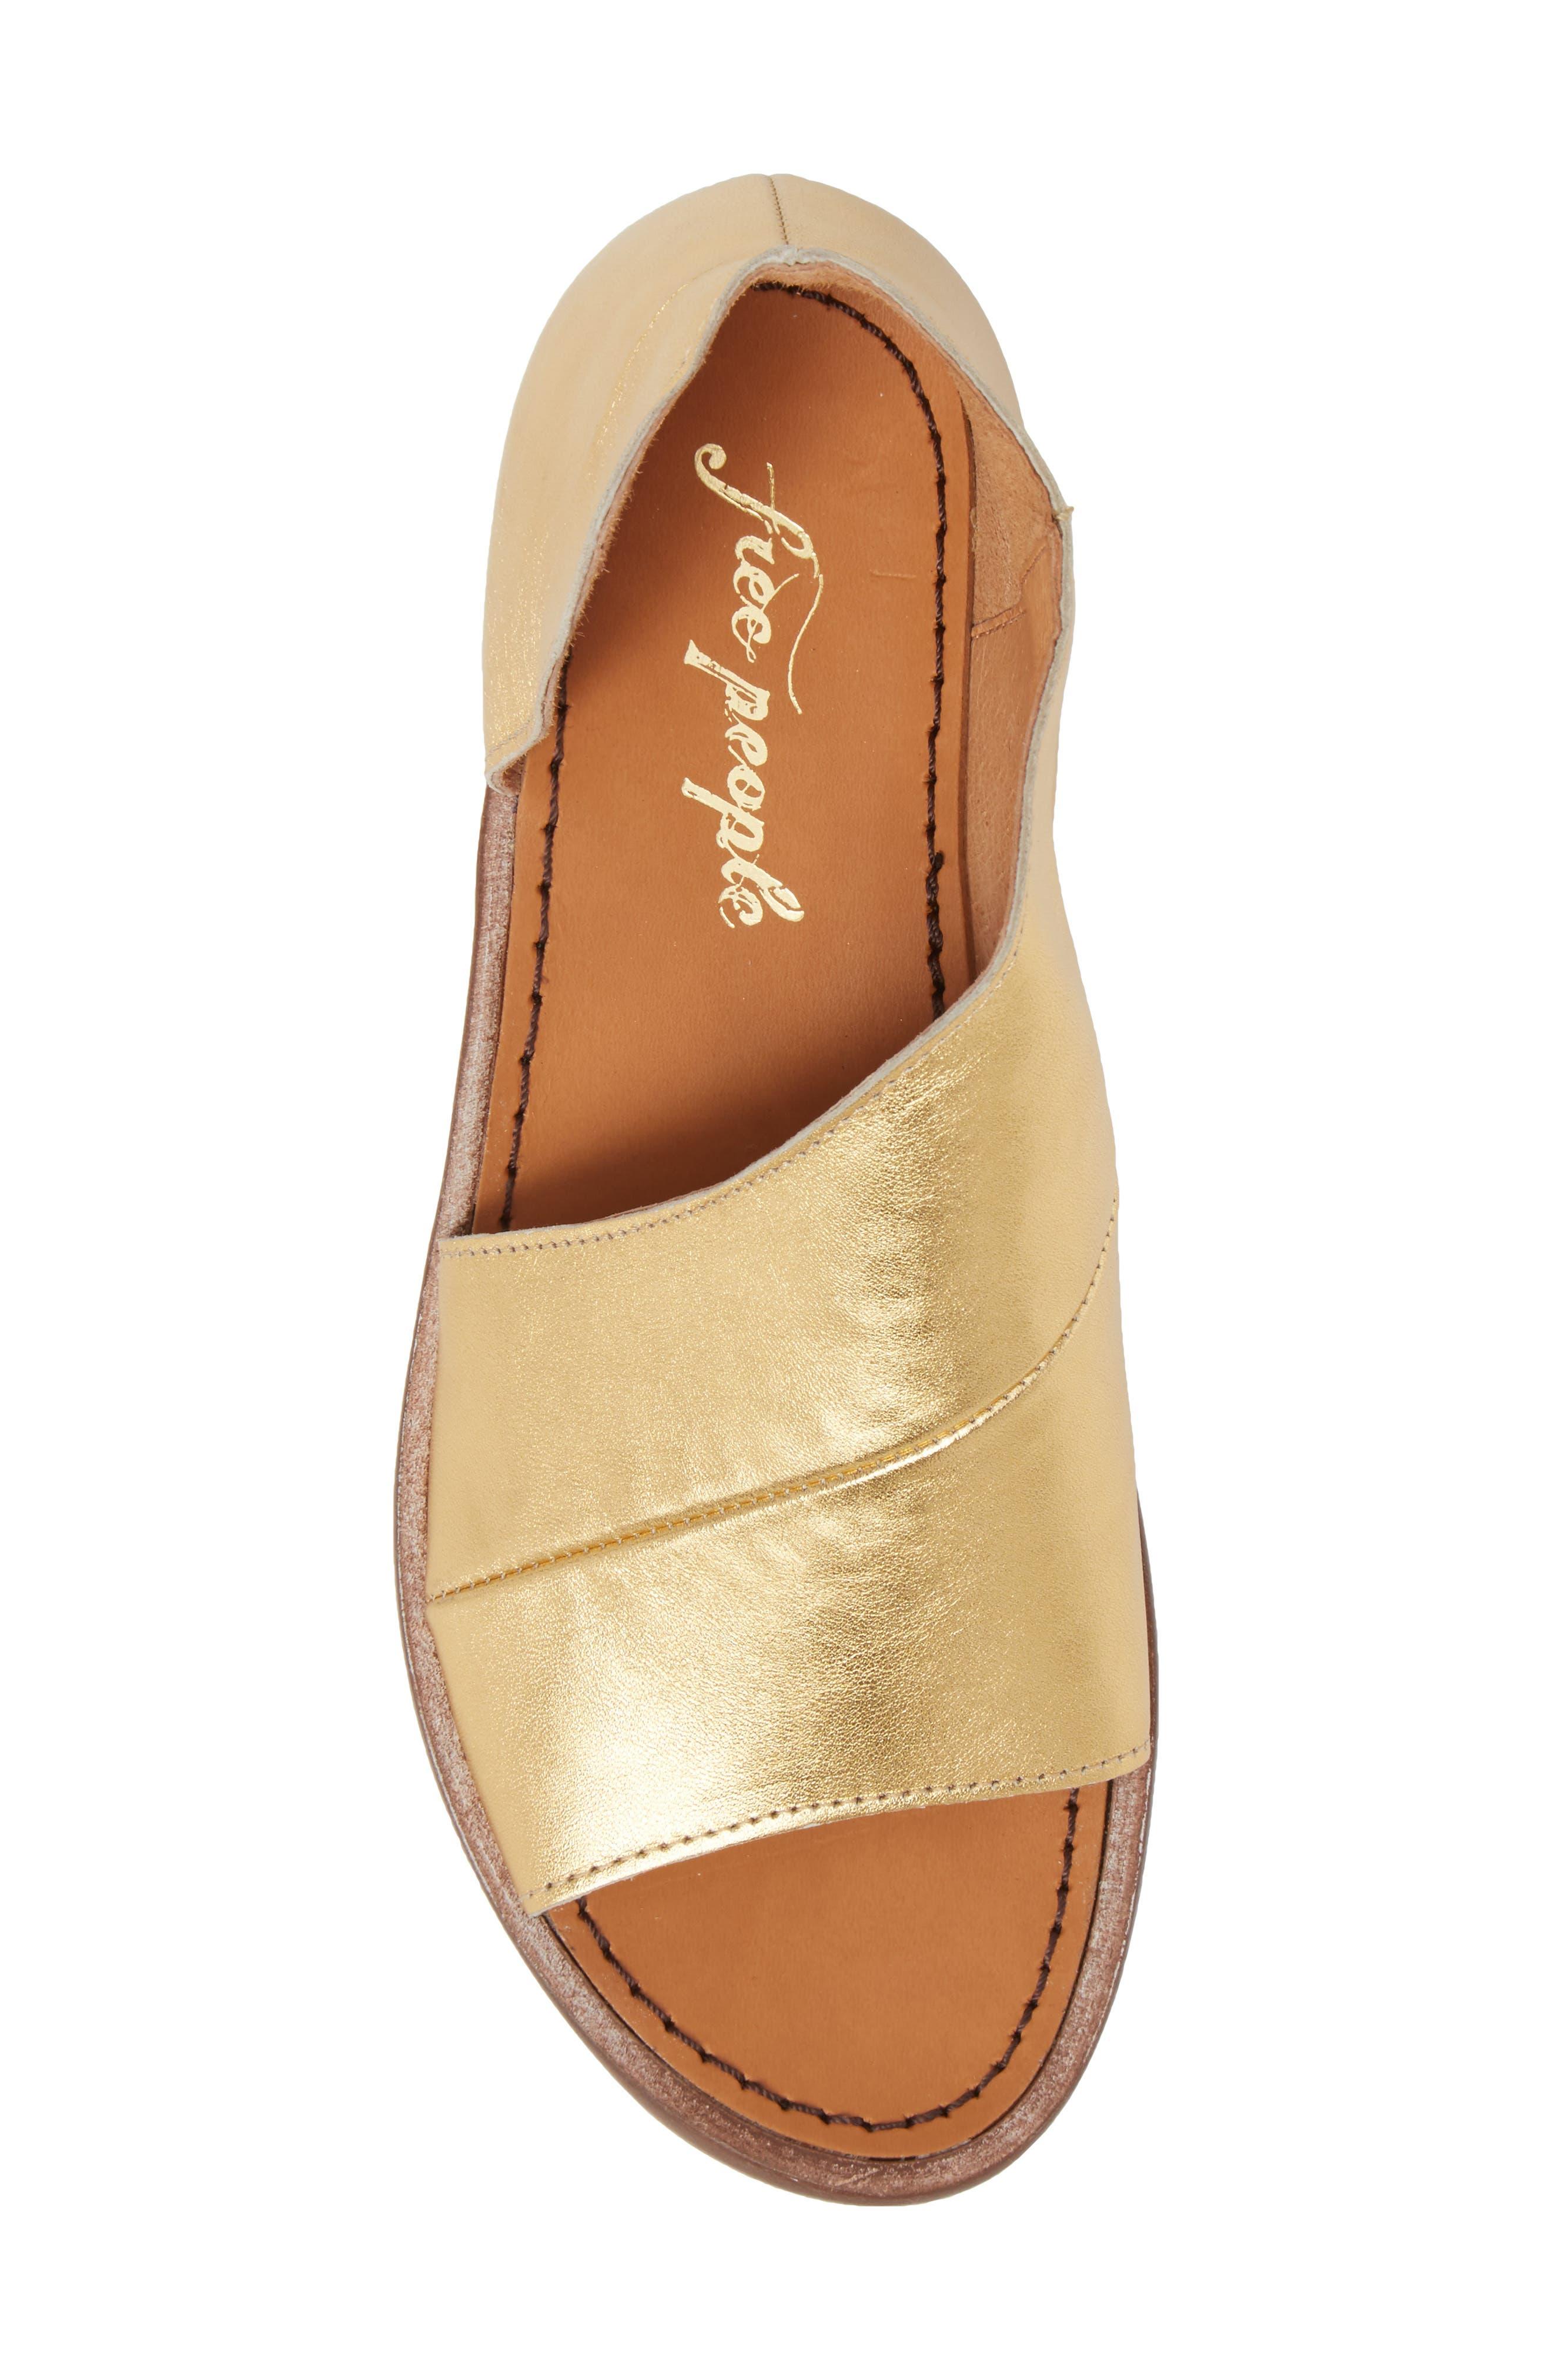 'Mont Blanc' Asymmetrical Sandal,                             Alternate thumbnail 58, color,